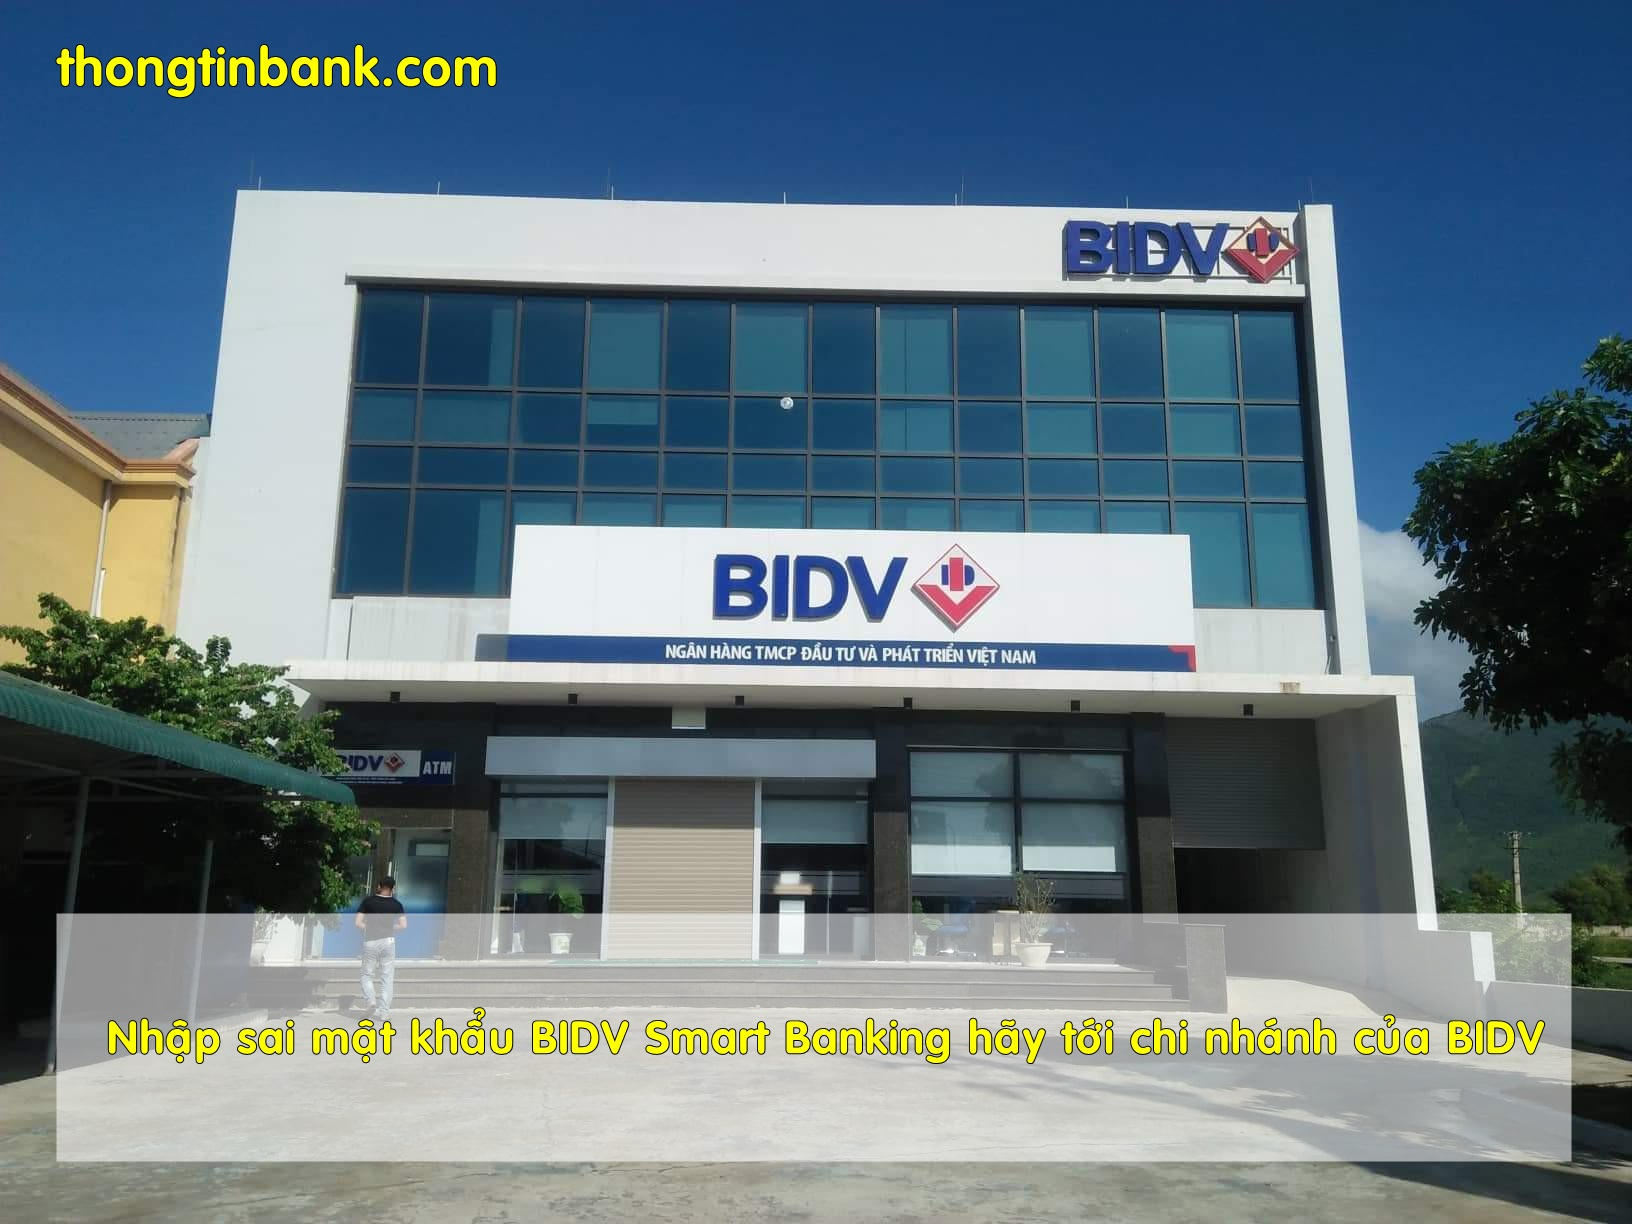 nhap-sai-mat-khau-bidv-smart-banking-1